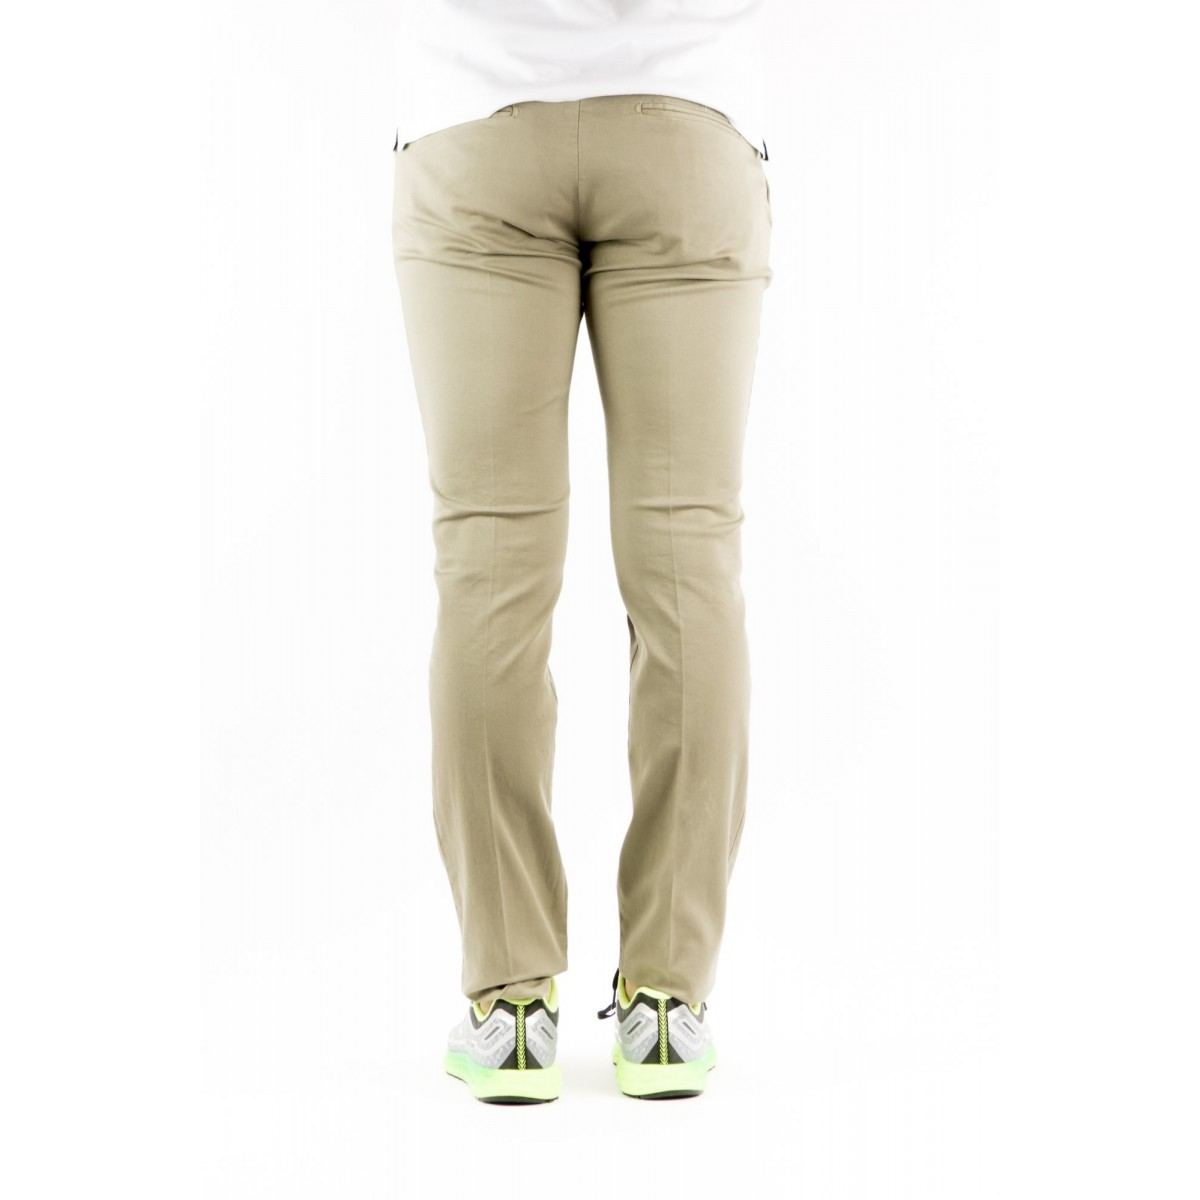 Trousers Entre Amis - 8201 292L17 Gabardina Strech 0505 - fango